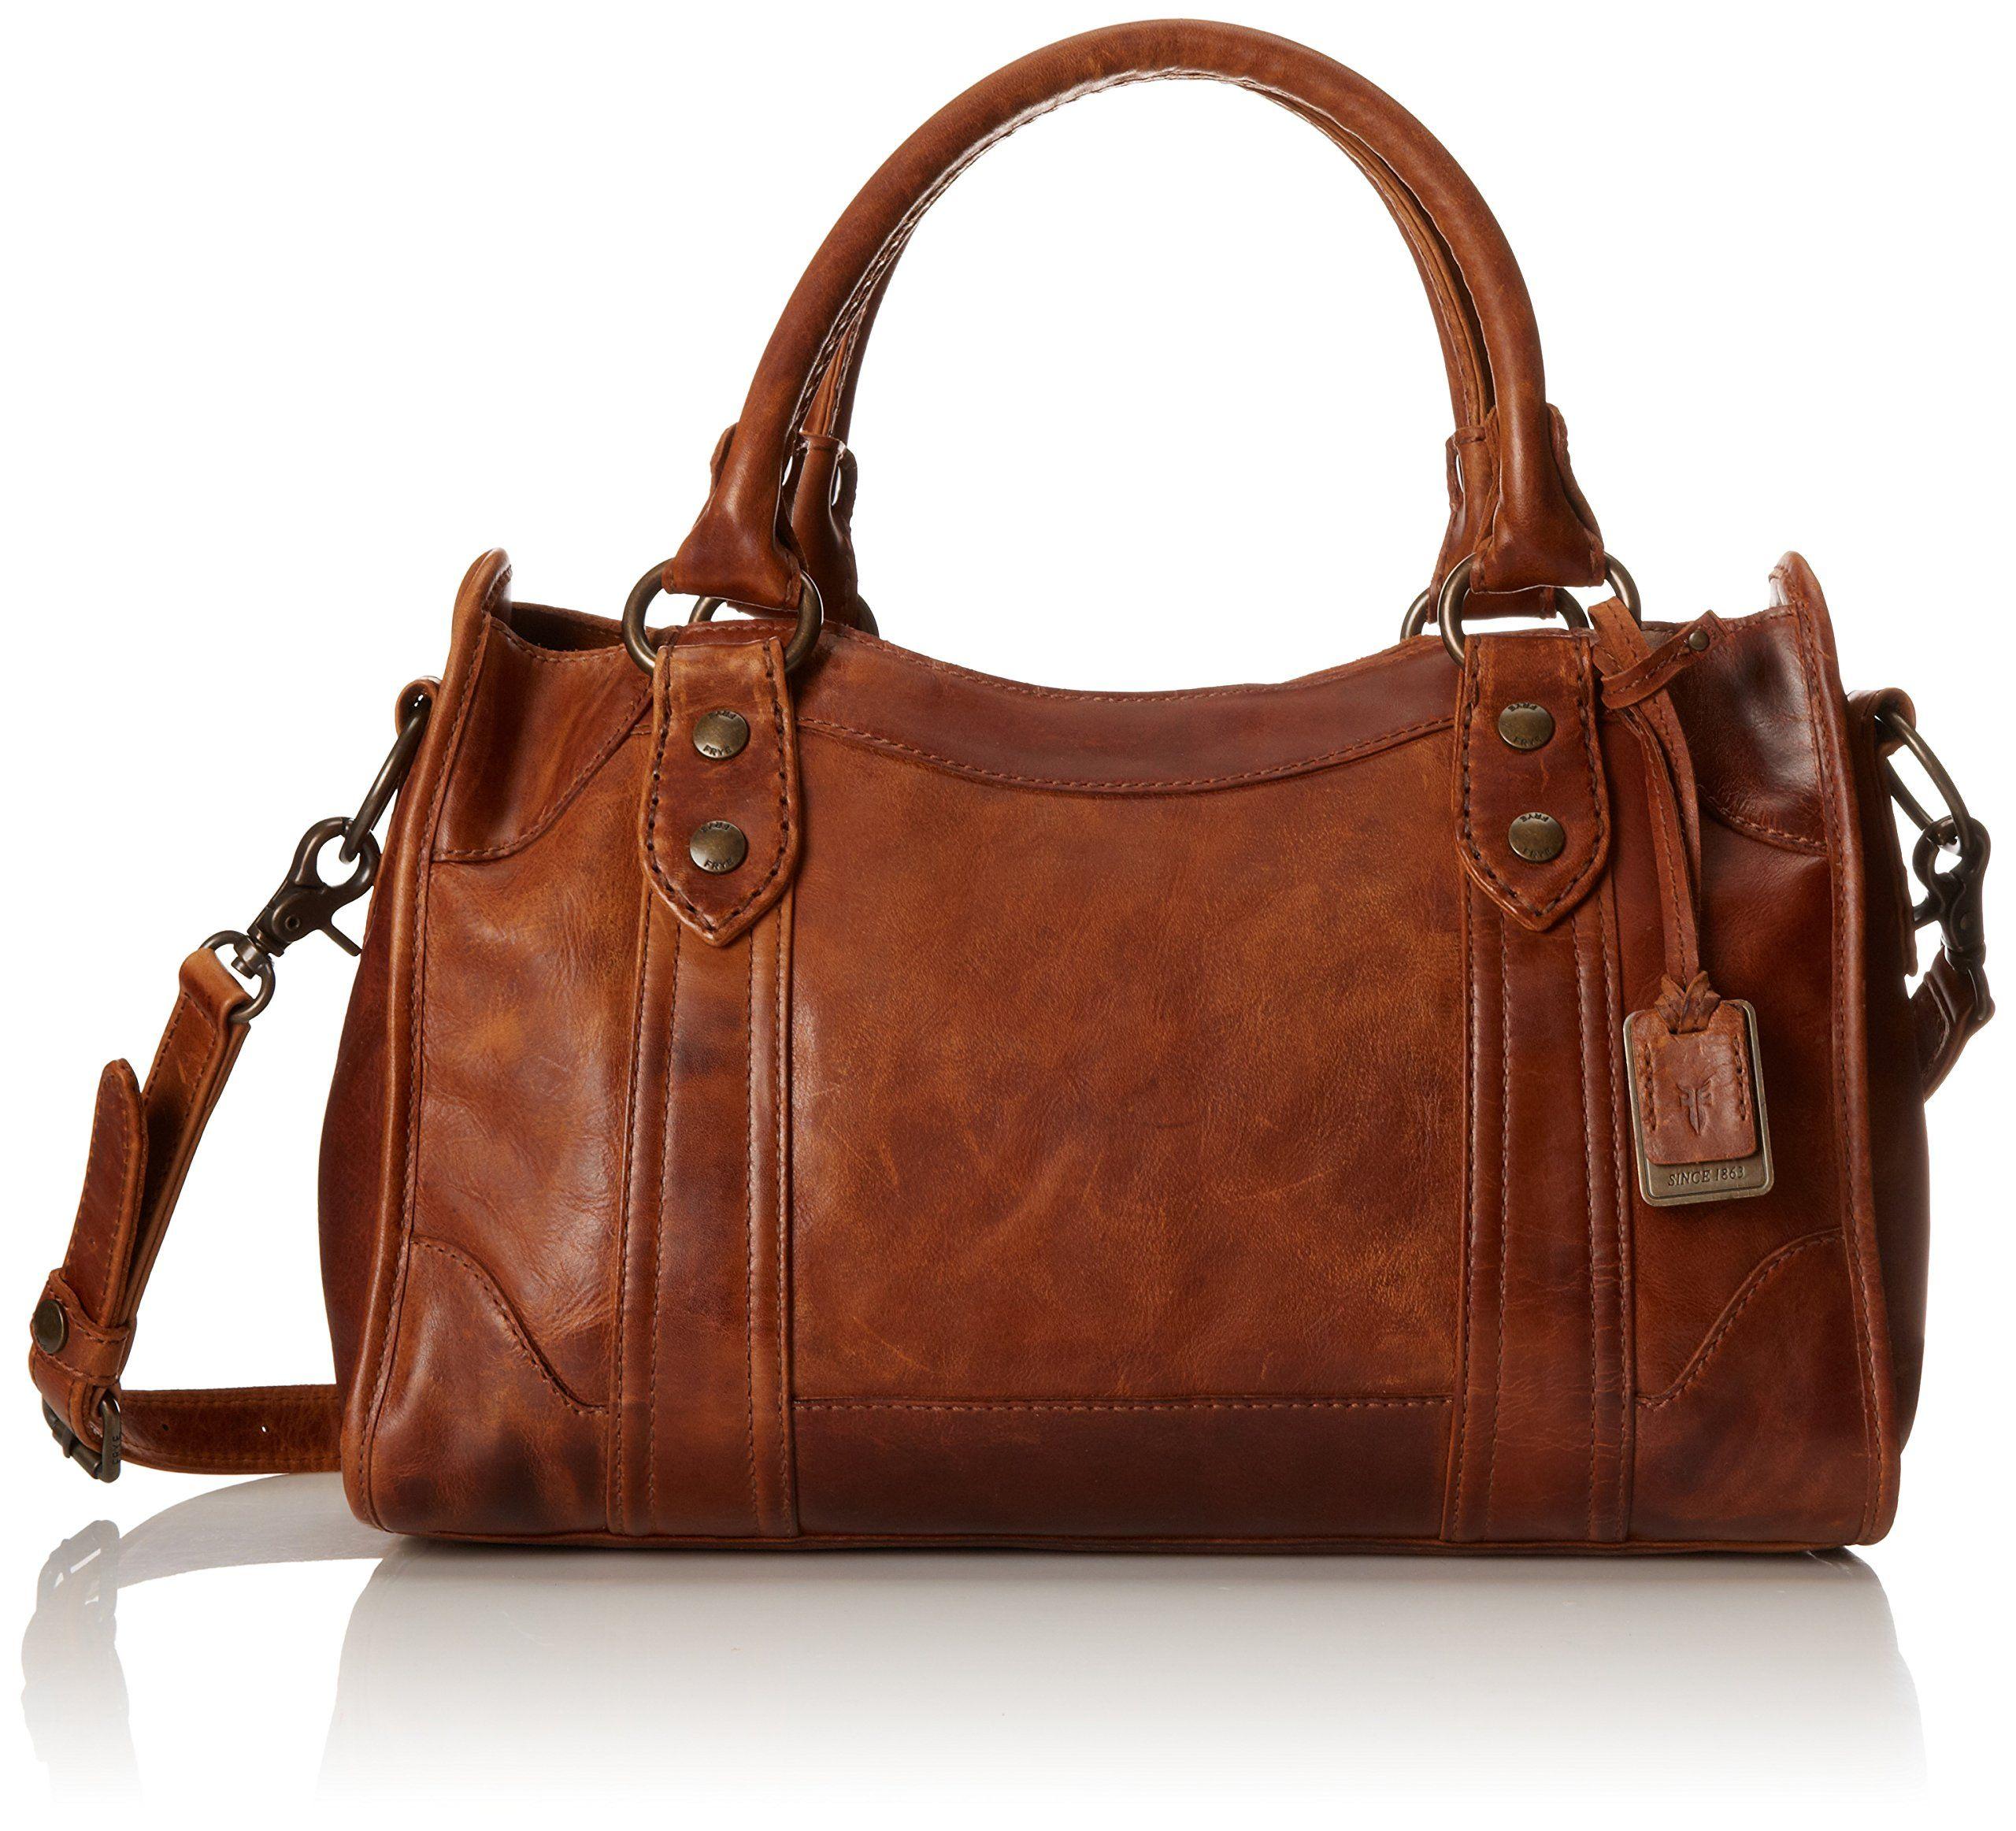 00f2db0ddf FRYE Melissa Satchel Handbag